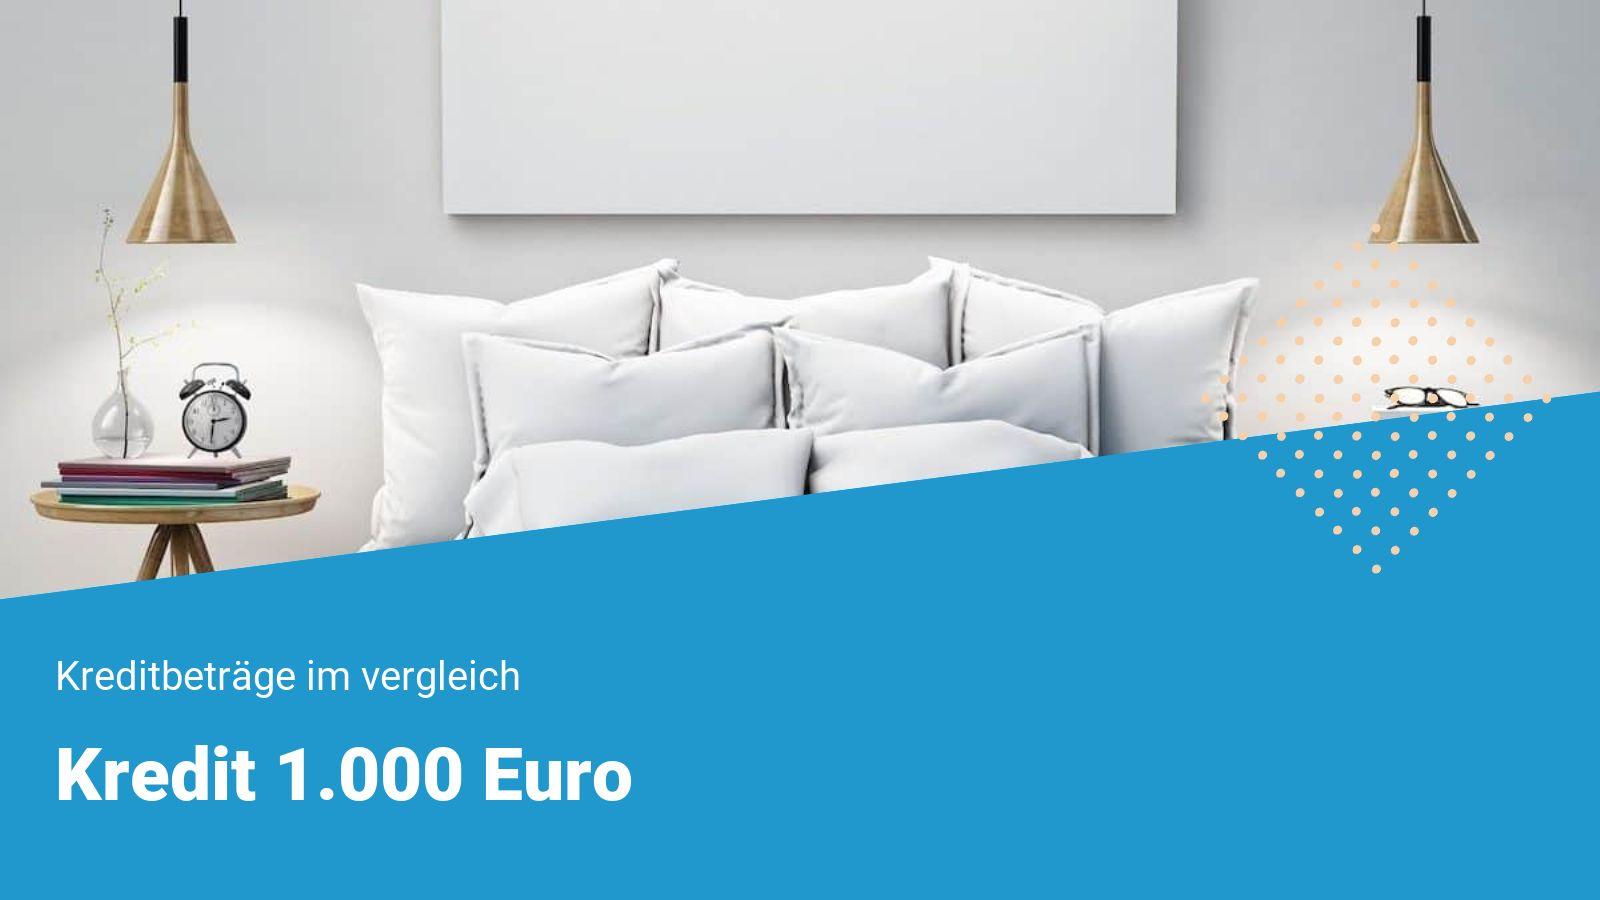 1000 Euro Kredit